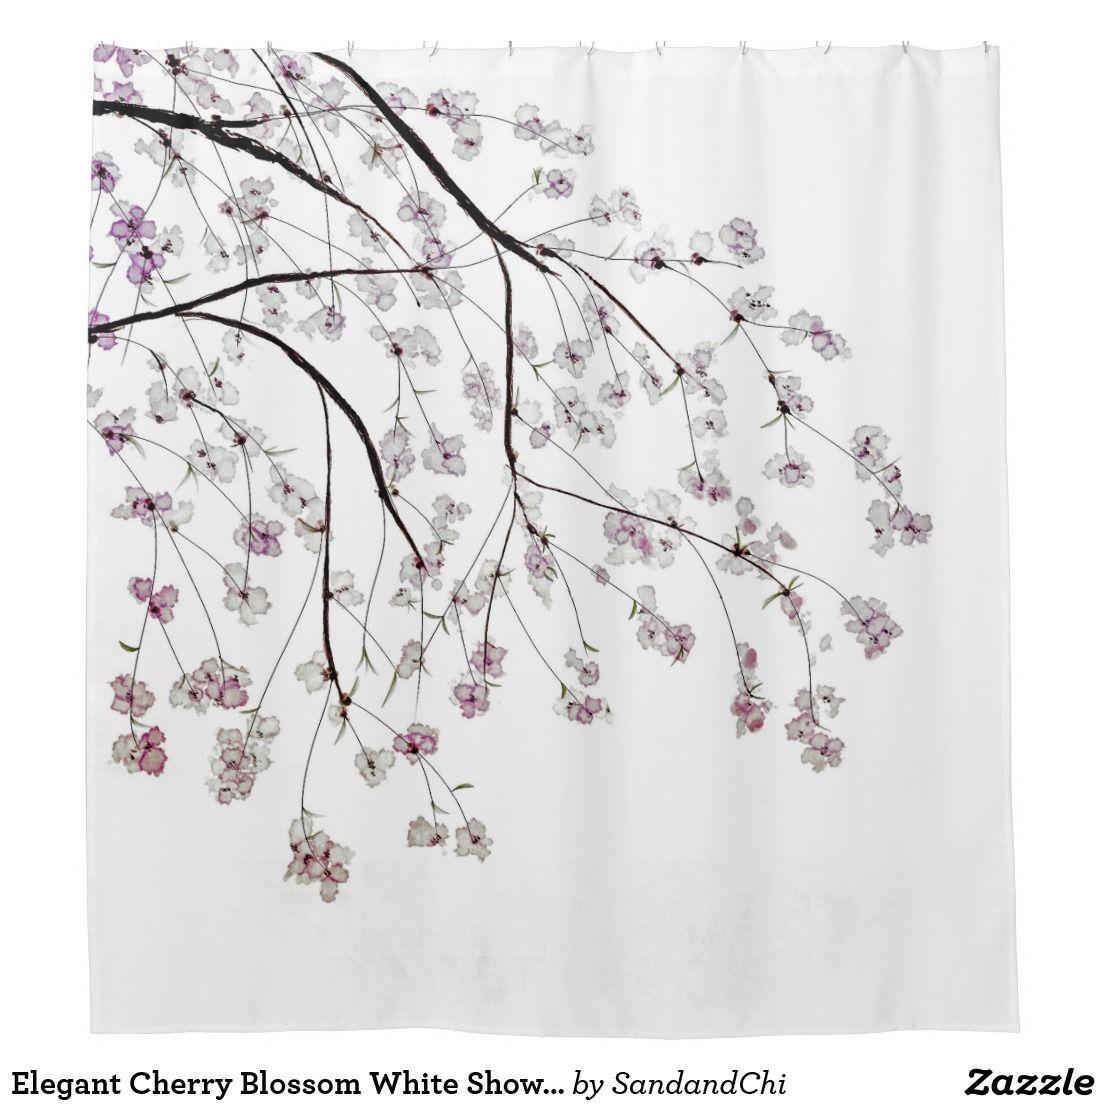 Elegant Cherry Blossom White Shower Curtain Zazzle Com White Shower Curtain White Shower Custom Shower Curtains